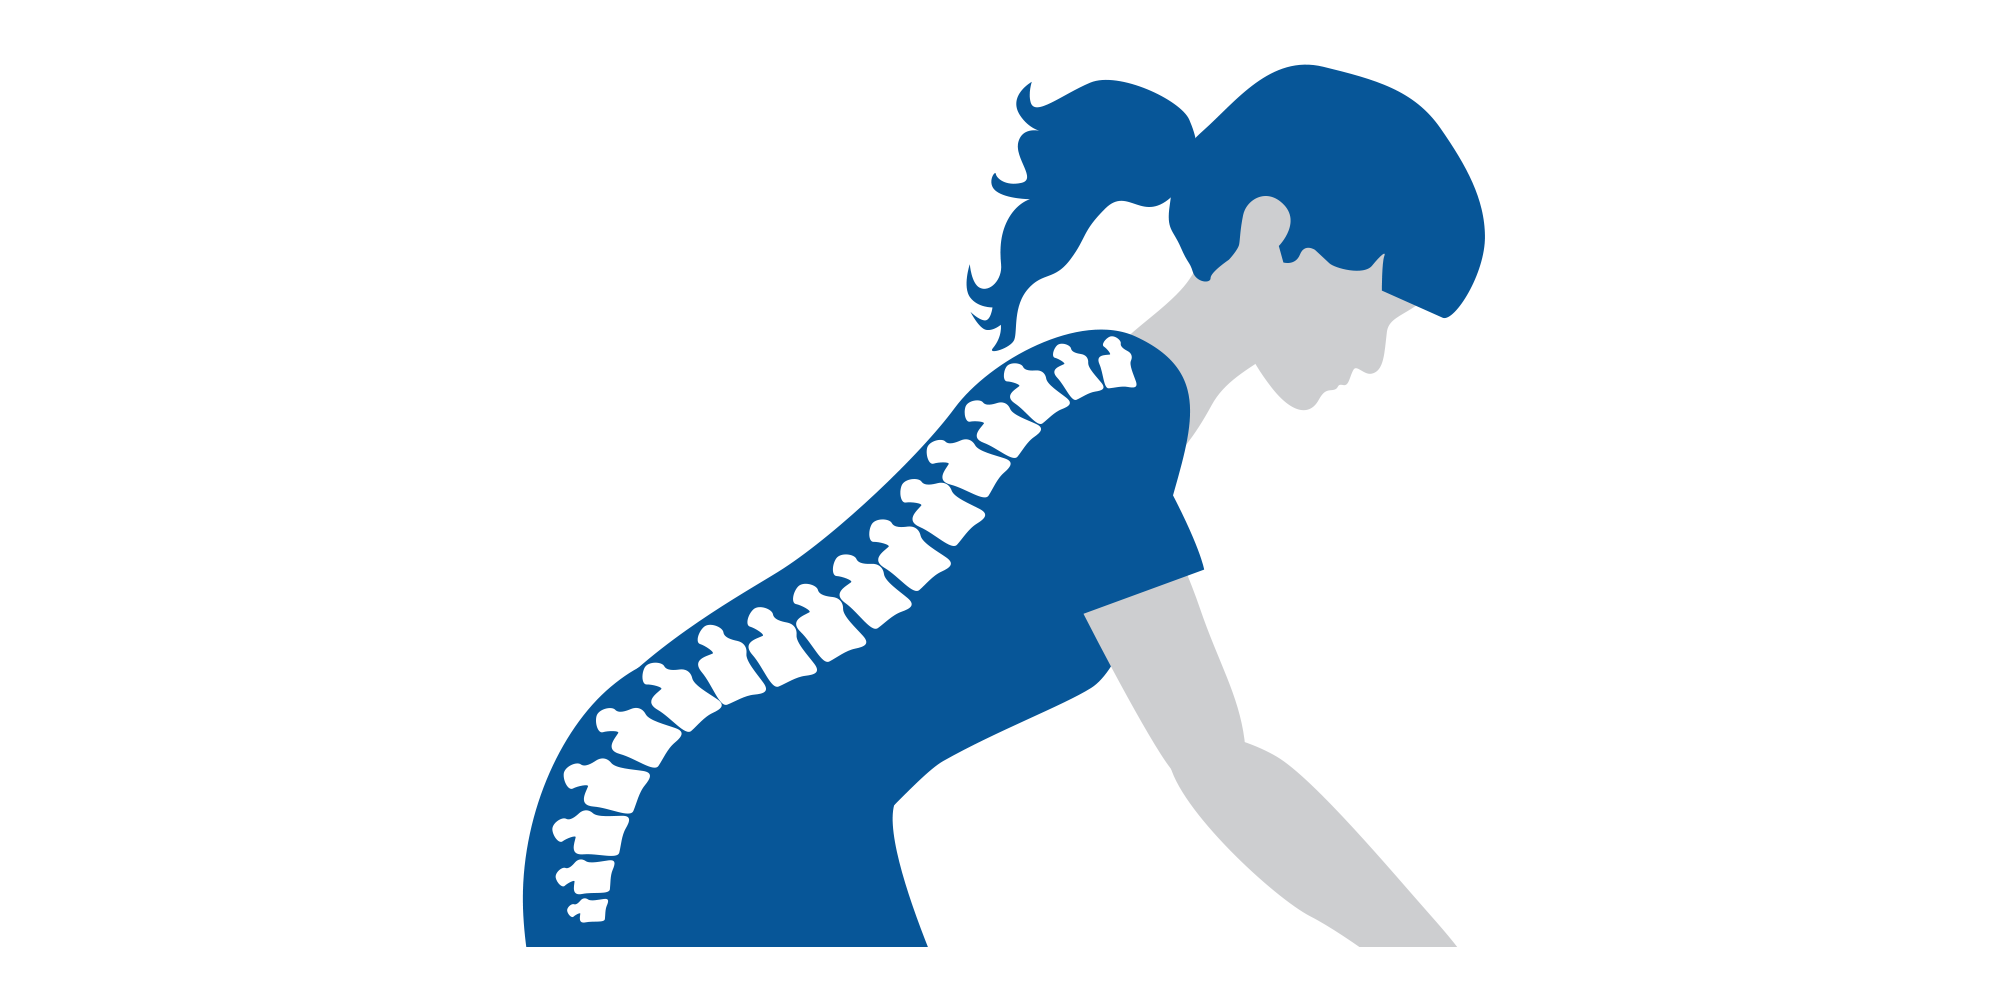 bøyd rygg